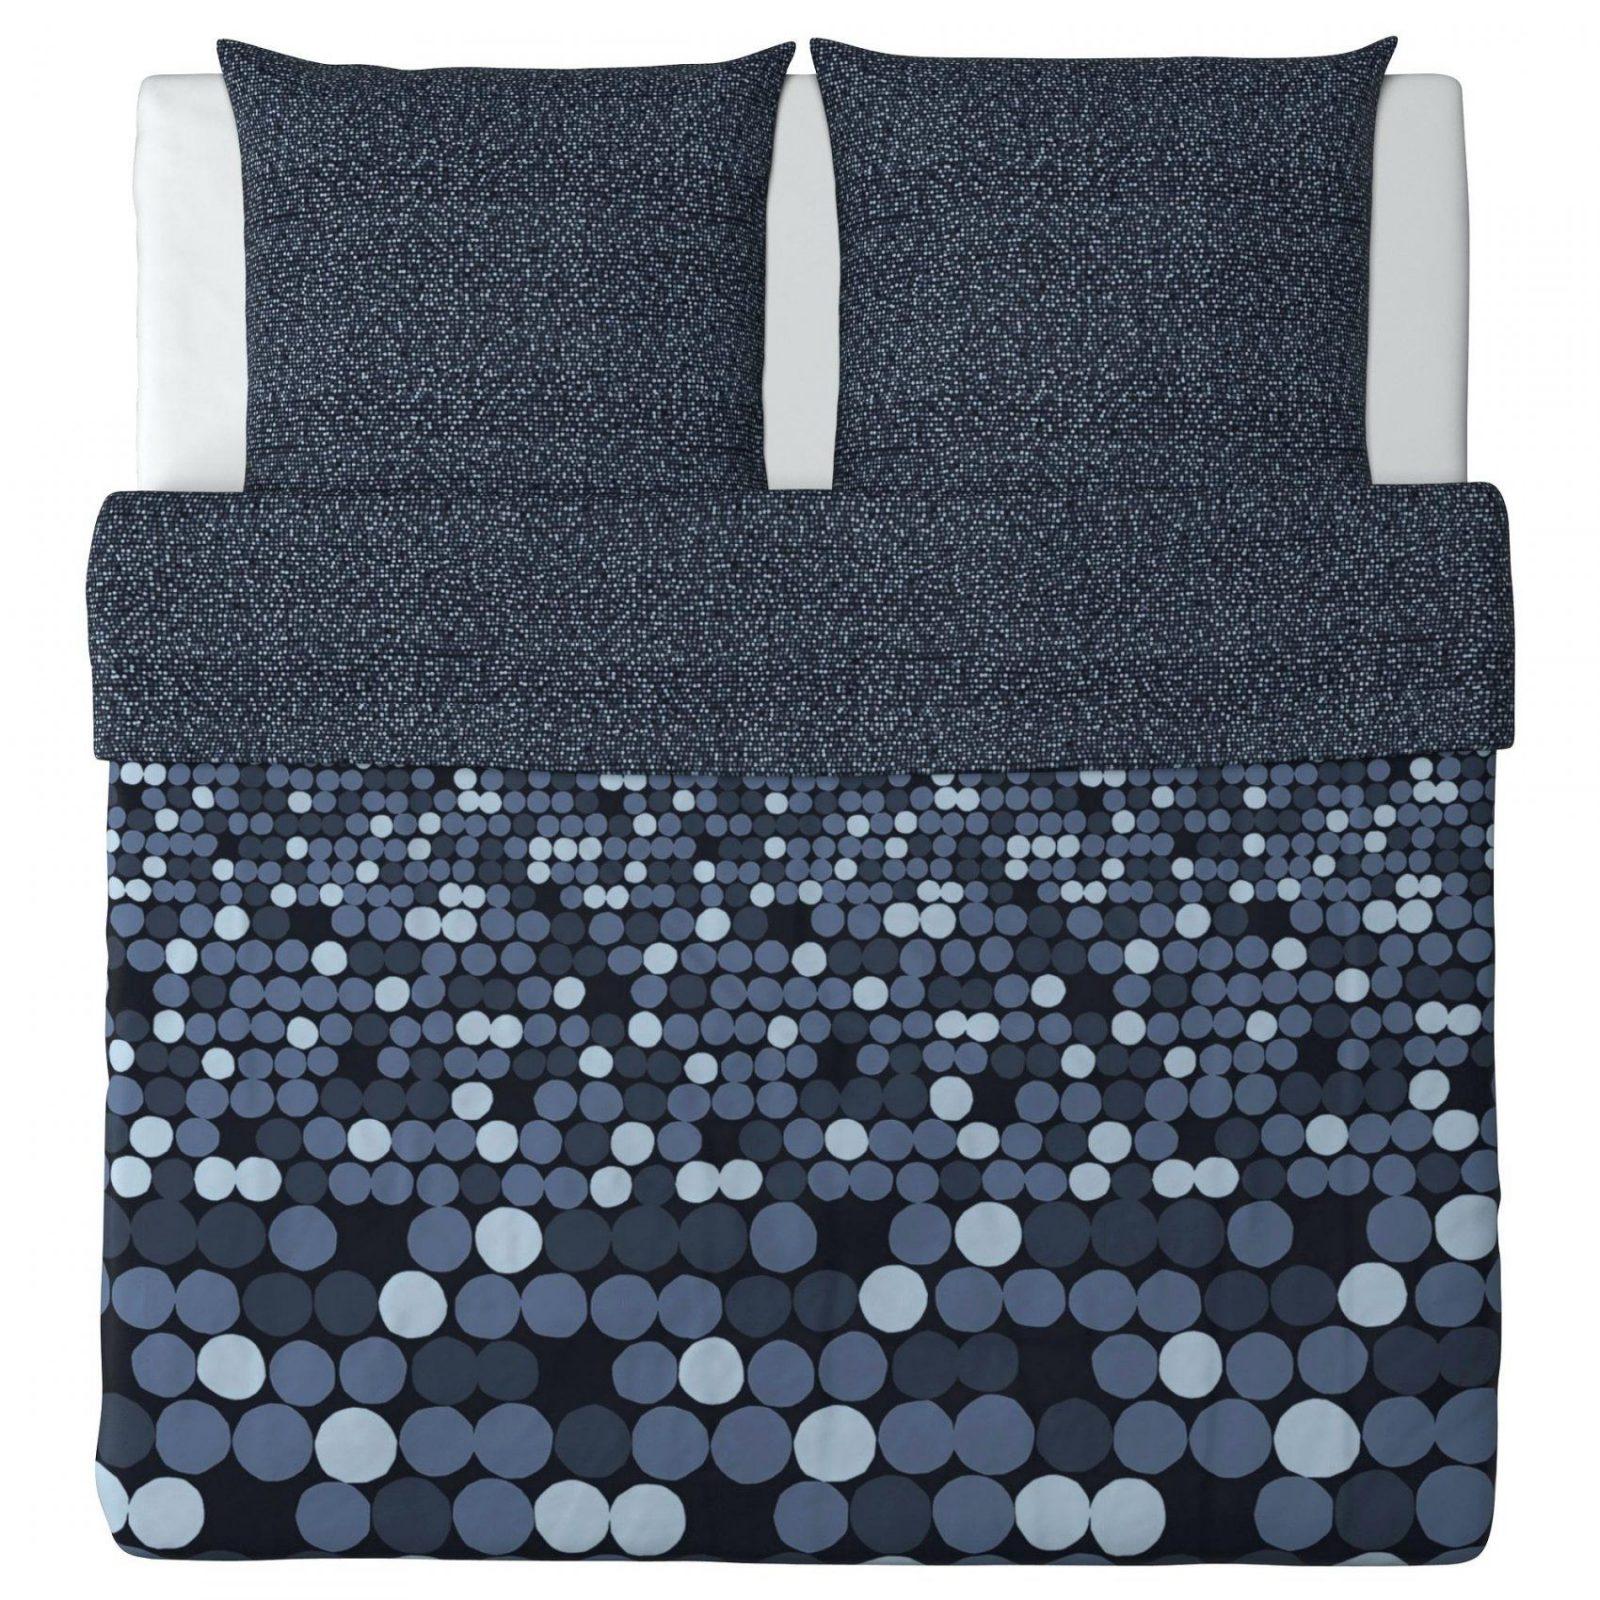 ikea svedstarr bettw sche set bettgarnitur 2teilig rot. Black Bedroom Furniture Sets. Home Design Ideas